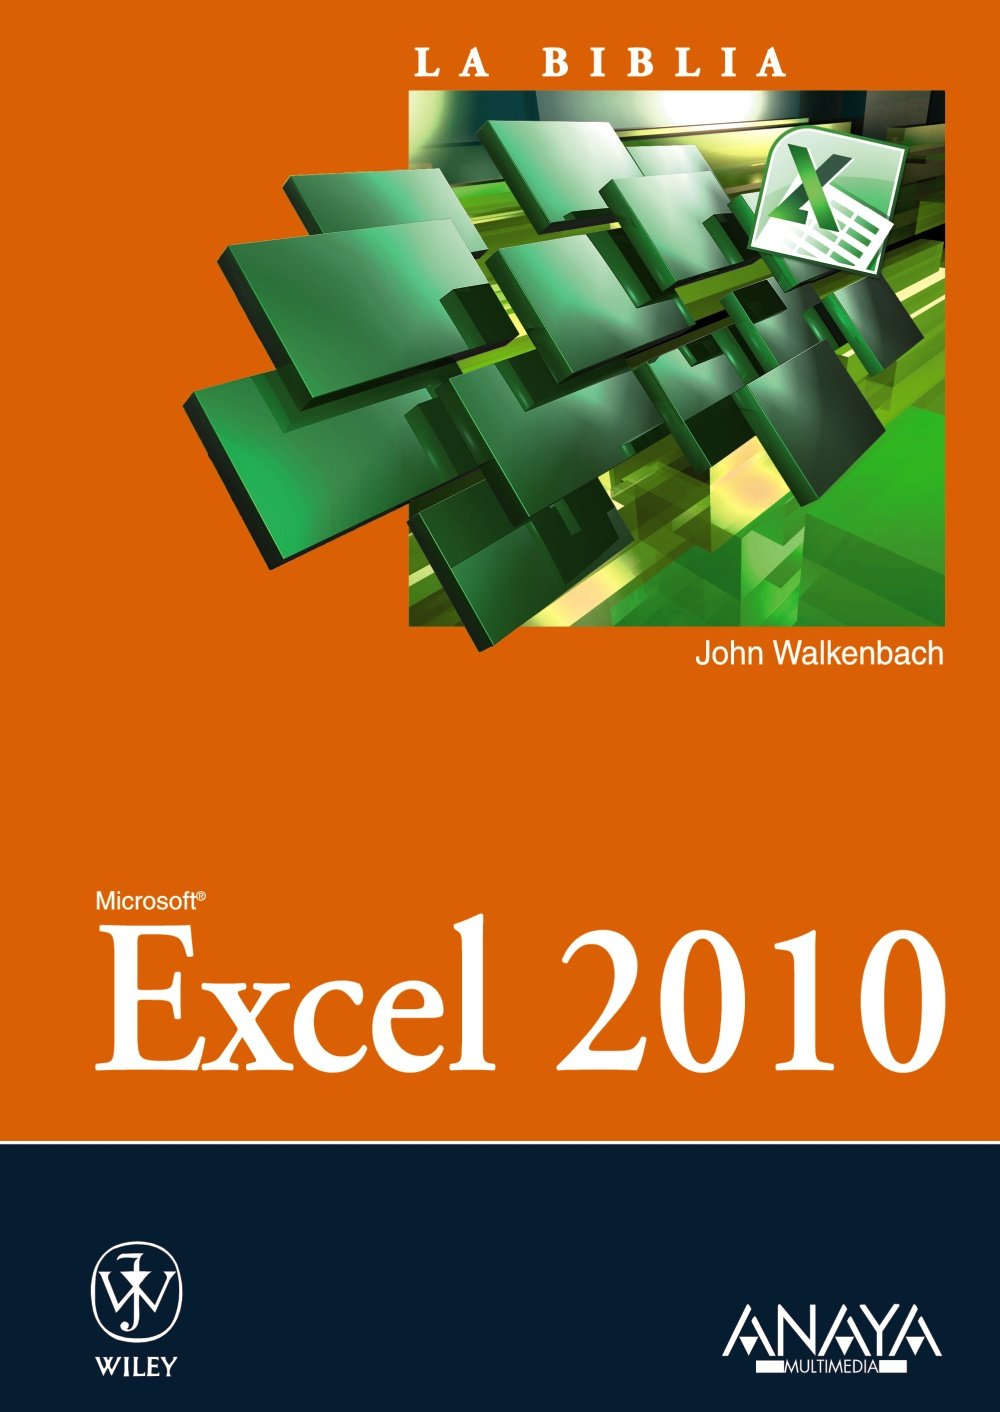 Excel 2010 / Microsoft Excel 2010 Bible (La Biblia / The Bible) (Spanish Edition) ebook